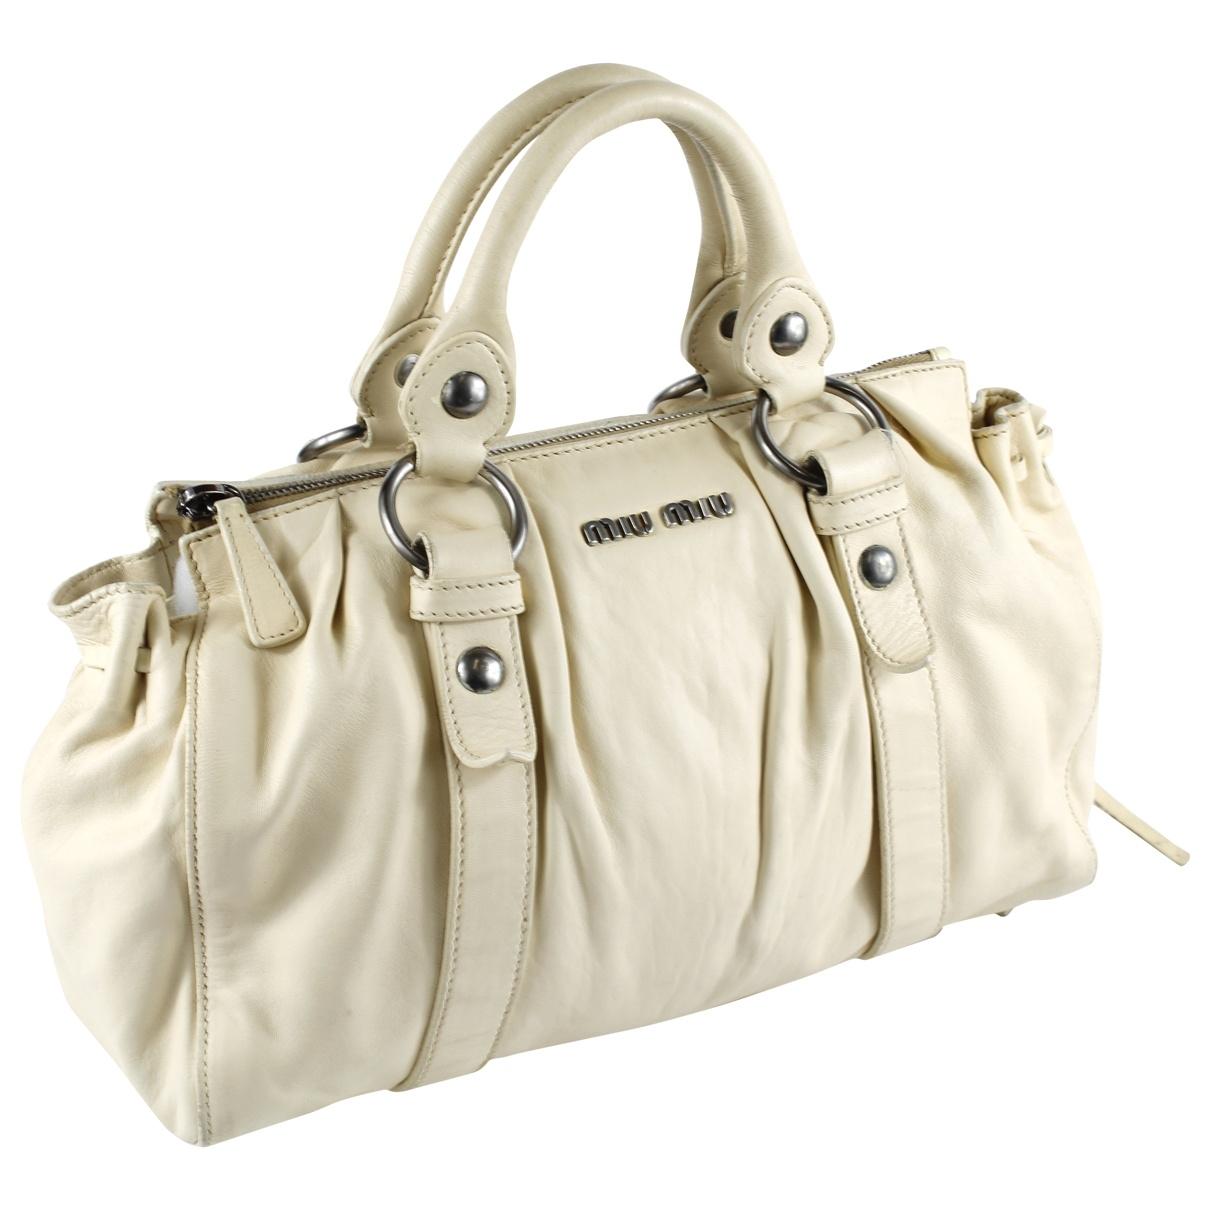 Miu Miu Bow bag Handtasche in  Beige Leder